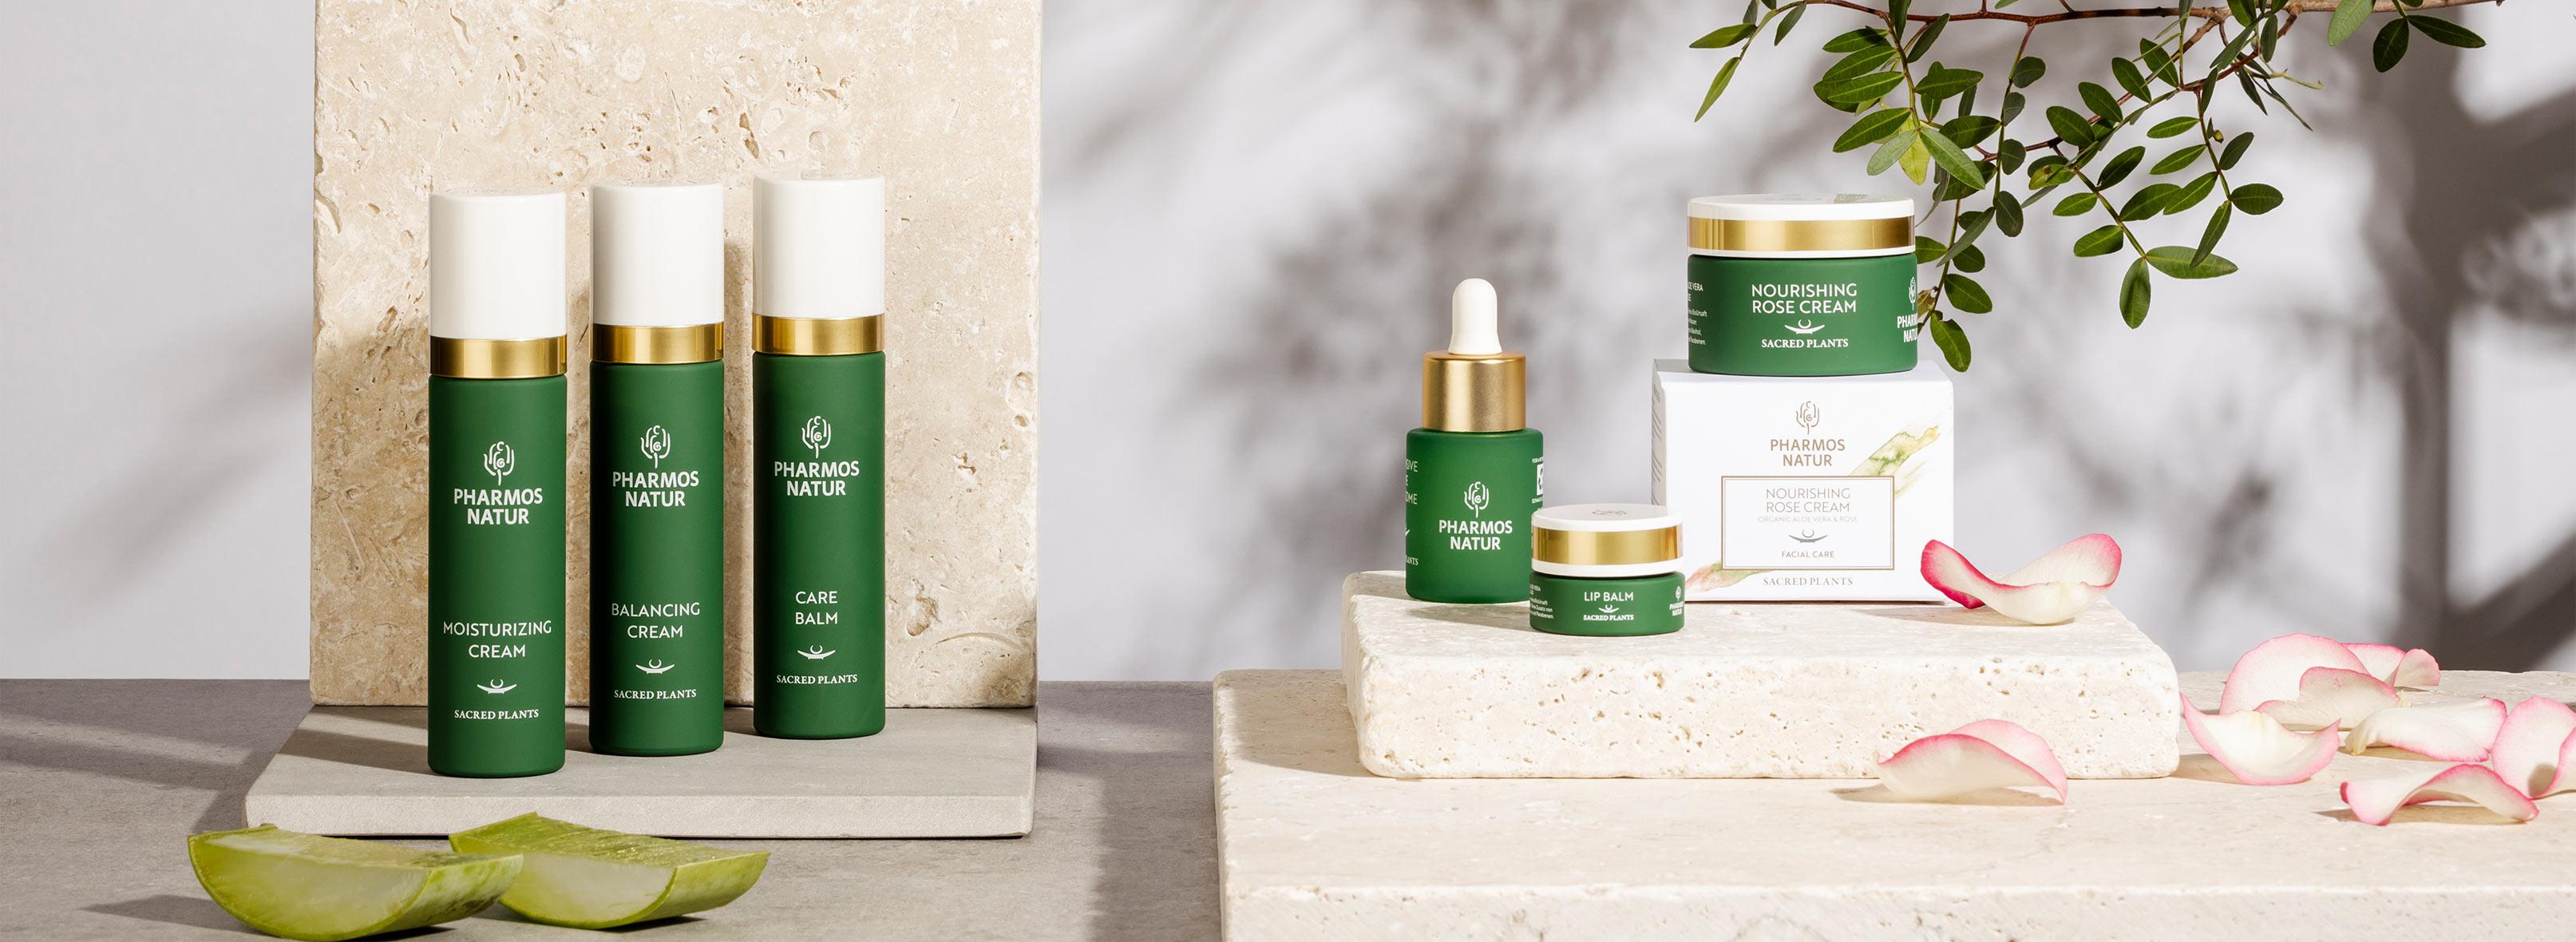 Produktlinie Facial Care  mit Moisturizing Cream, Balancing Cream, Care Balm, Nourishing Rose Cream